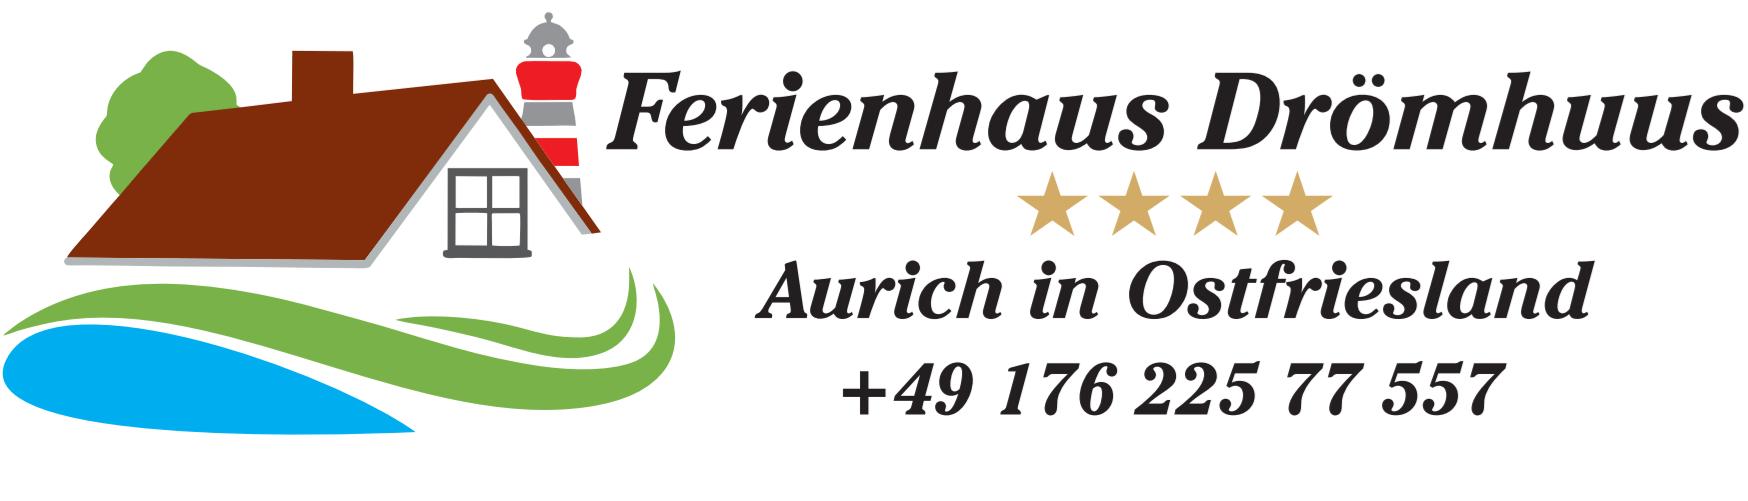 Ferienhaus Drömhuus Aurich am Badesee Tannenhausen – Nordsee